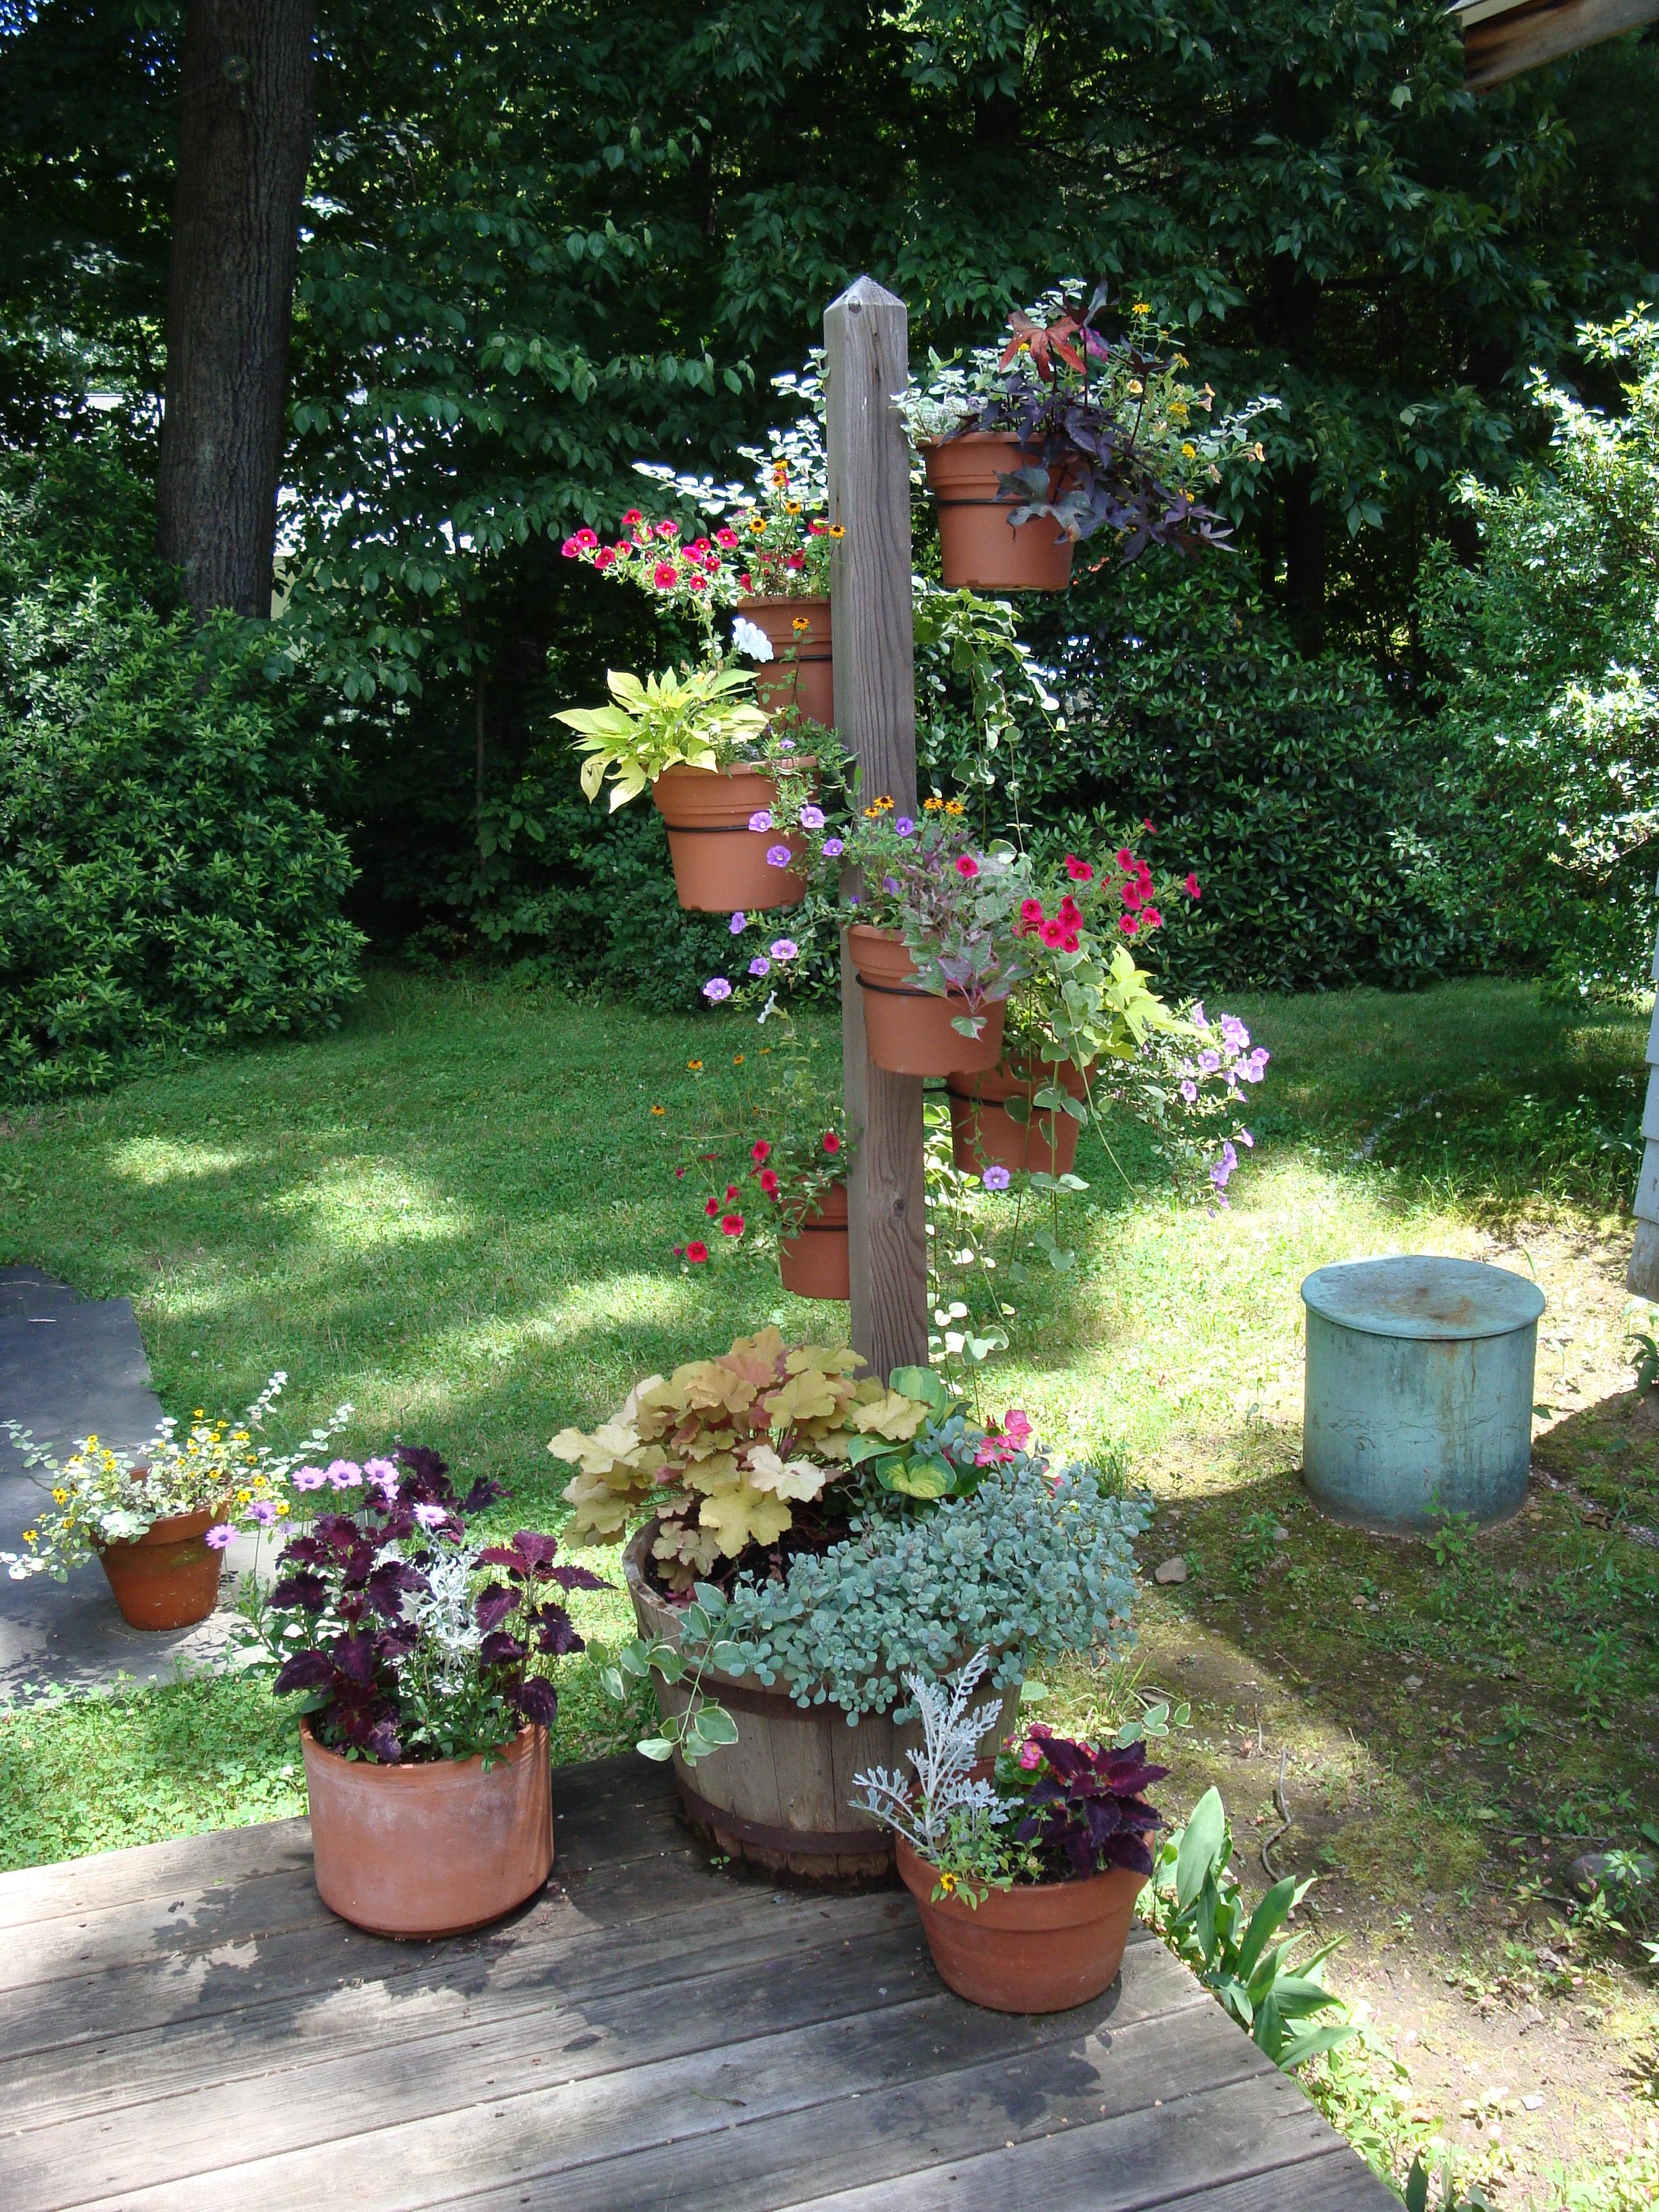 Fullsize Of Planter Gardening Ideas